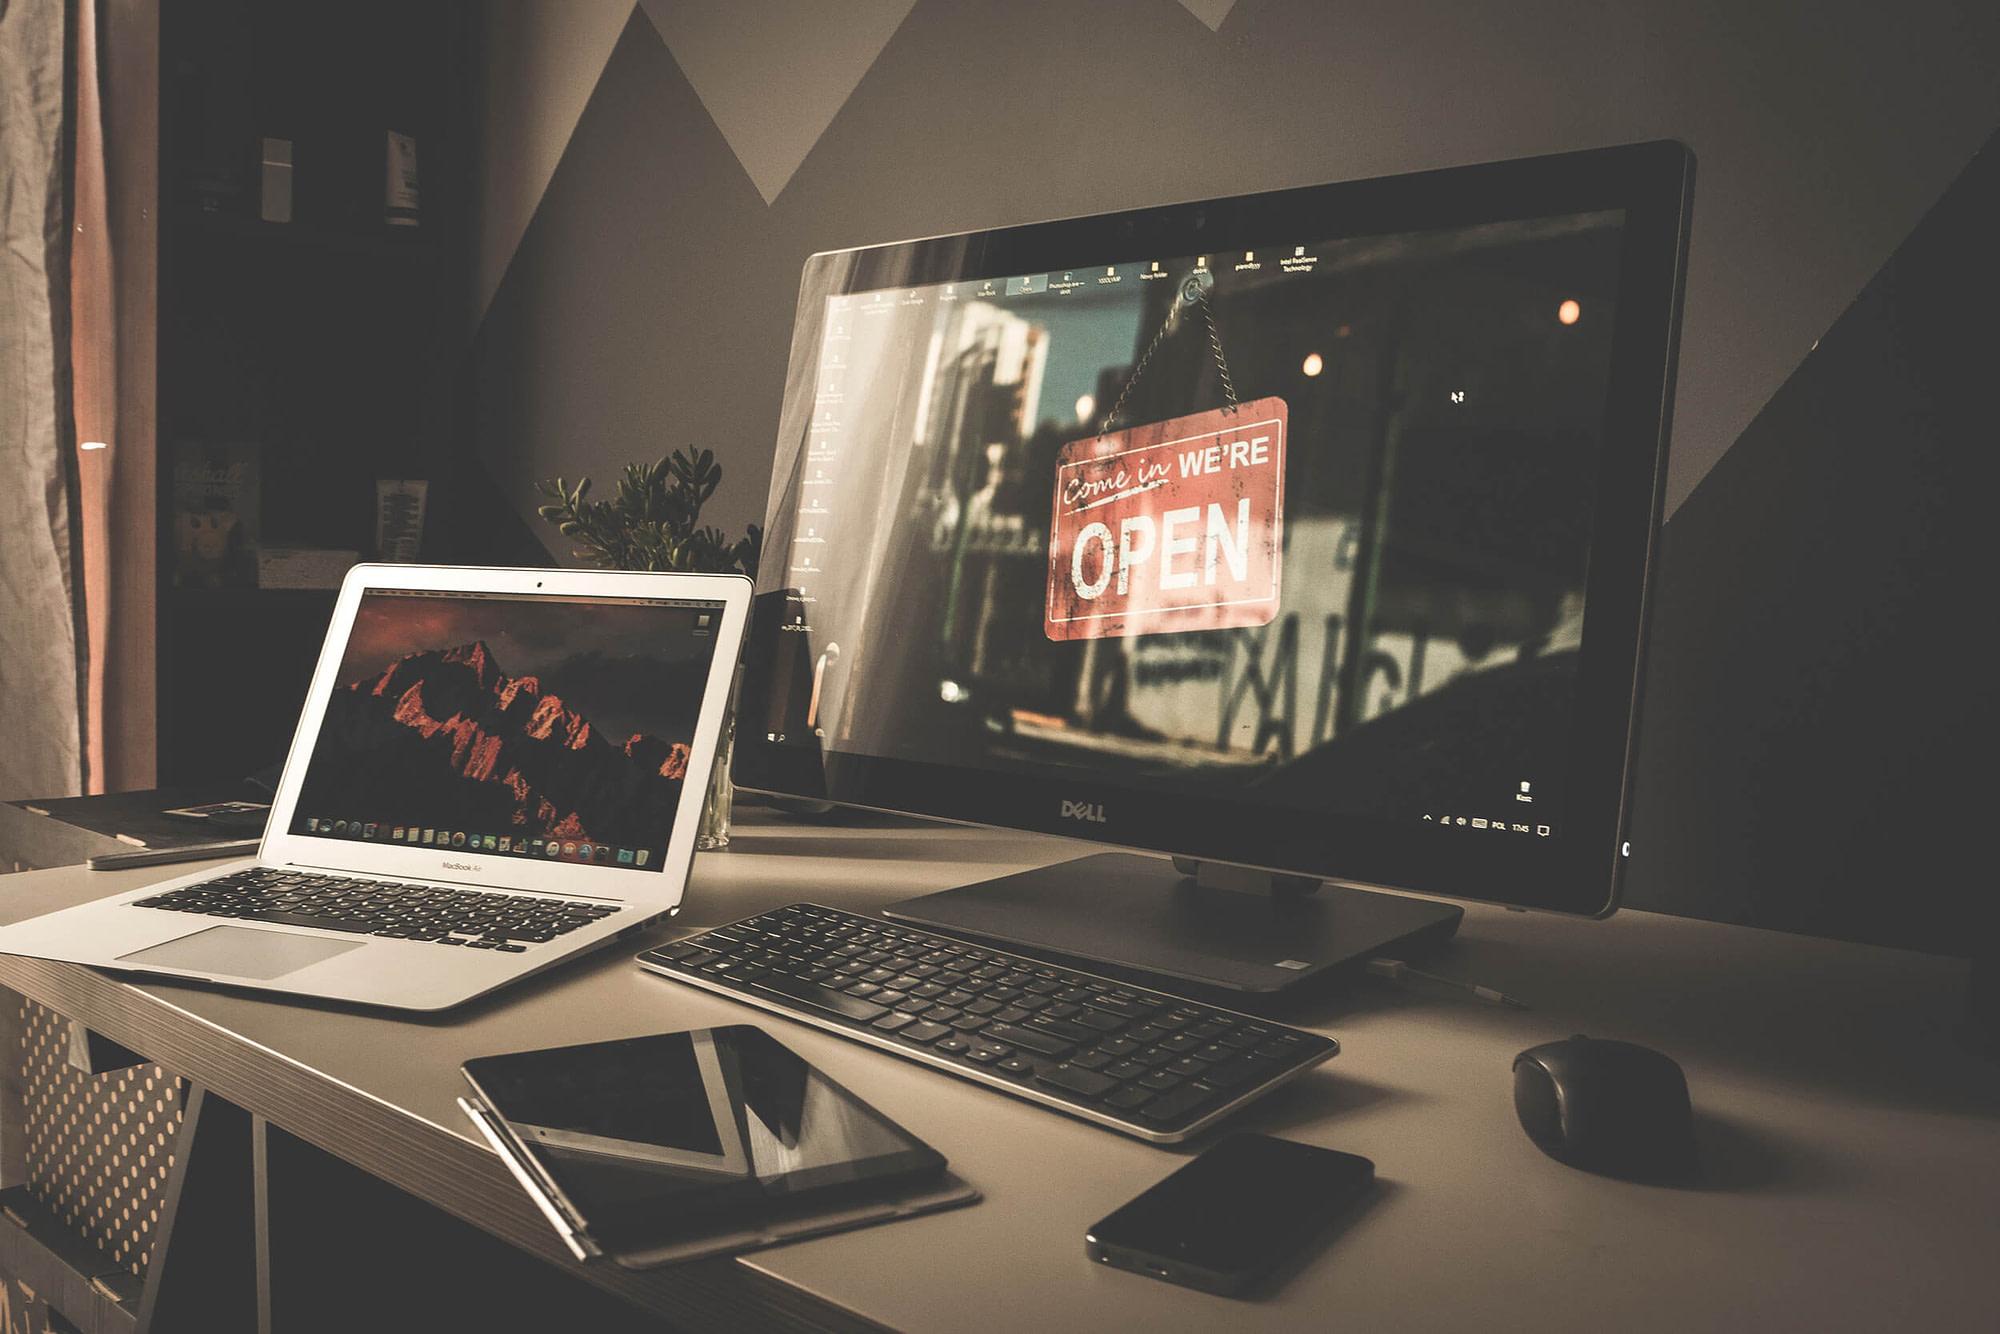 aviva-domasian-blog-website-costs-pexels-mateusz-dach-web2